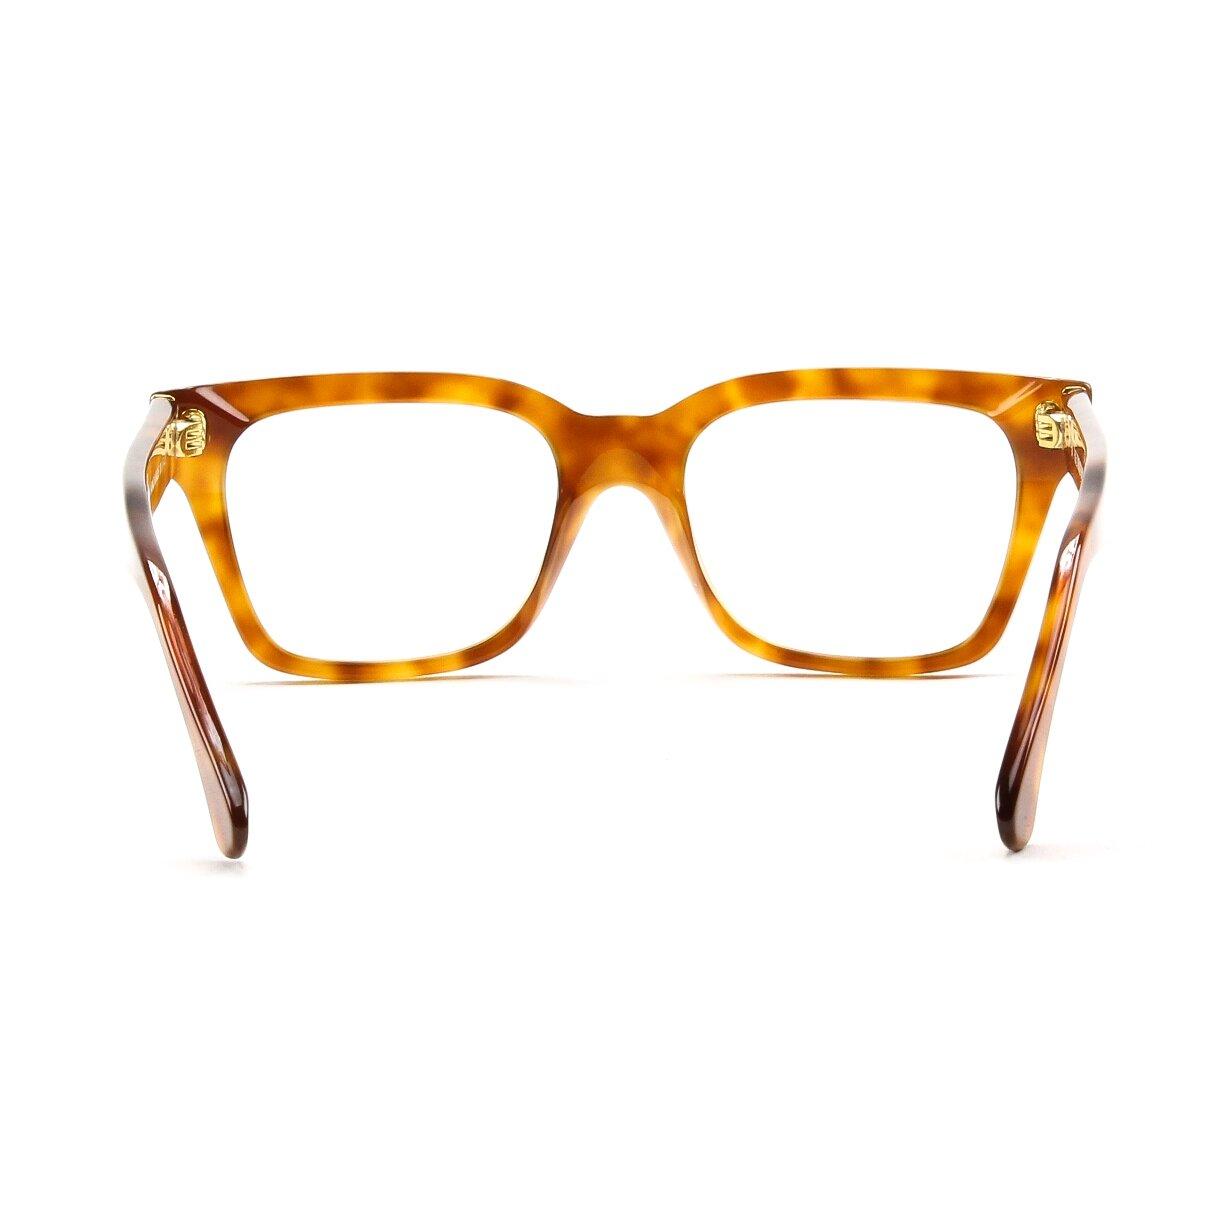 bf9d2276bab Super America 625 Eyeglasses Optical Light Havana by RETROSUPERFUTURE   RETROSUPERFUTURE  Amazon.co.uk  Clothing